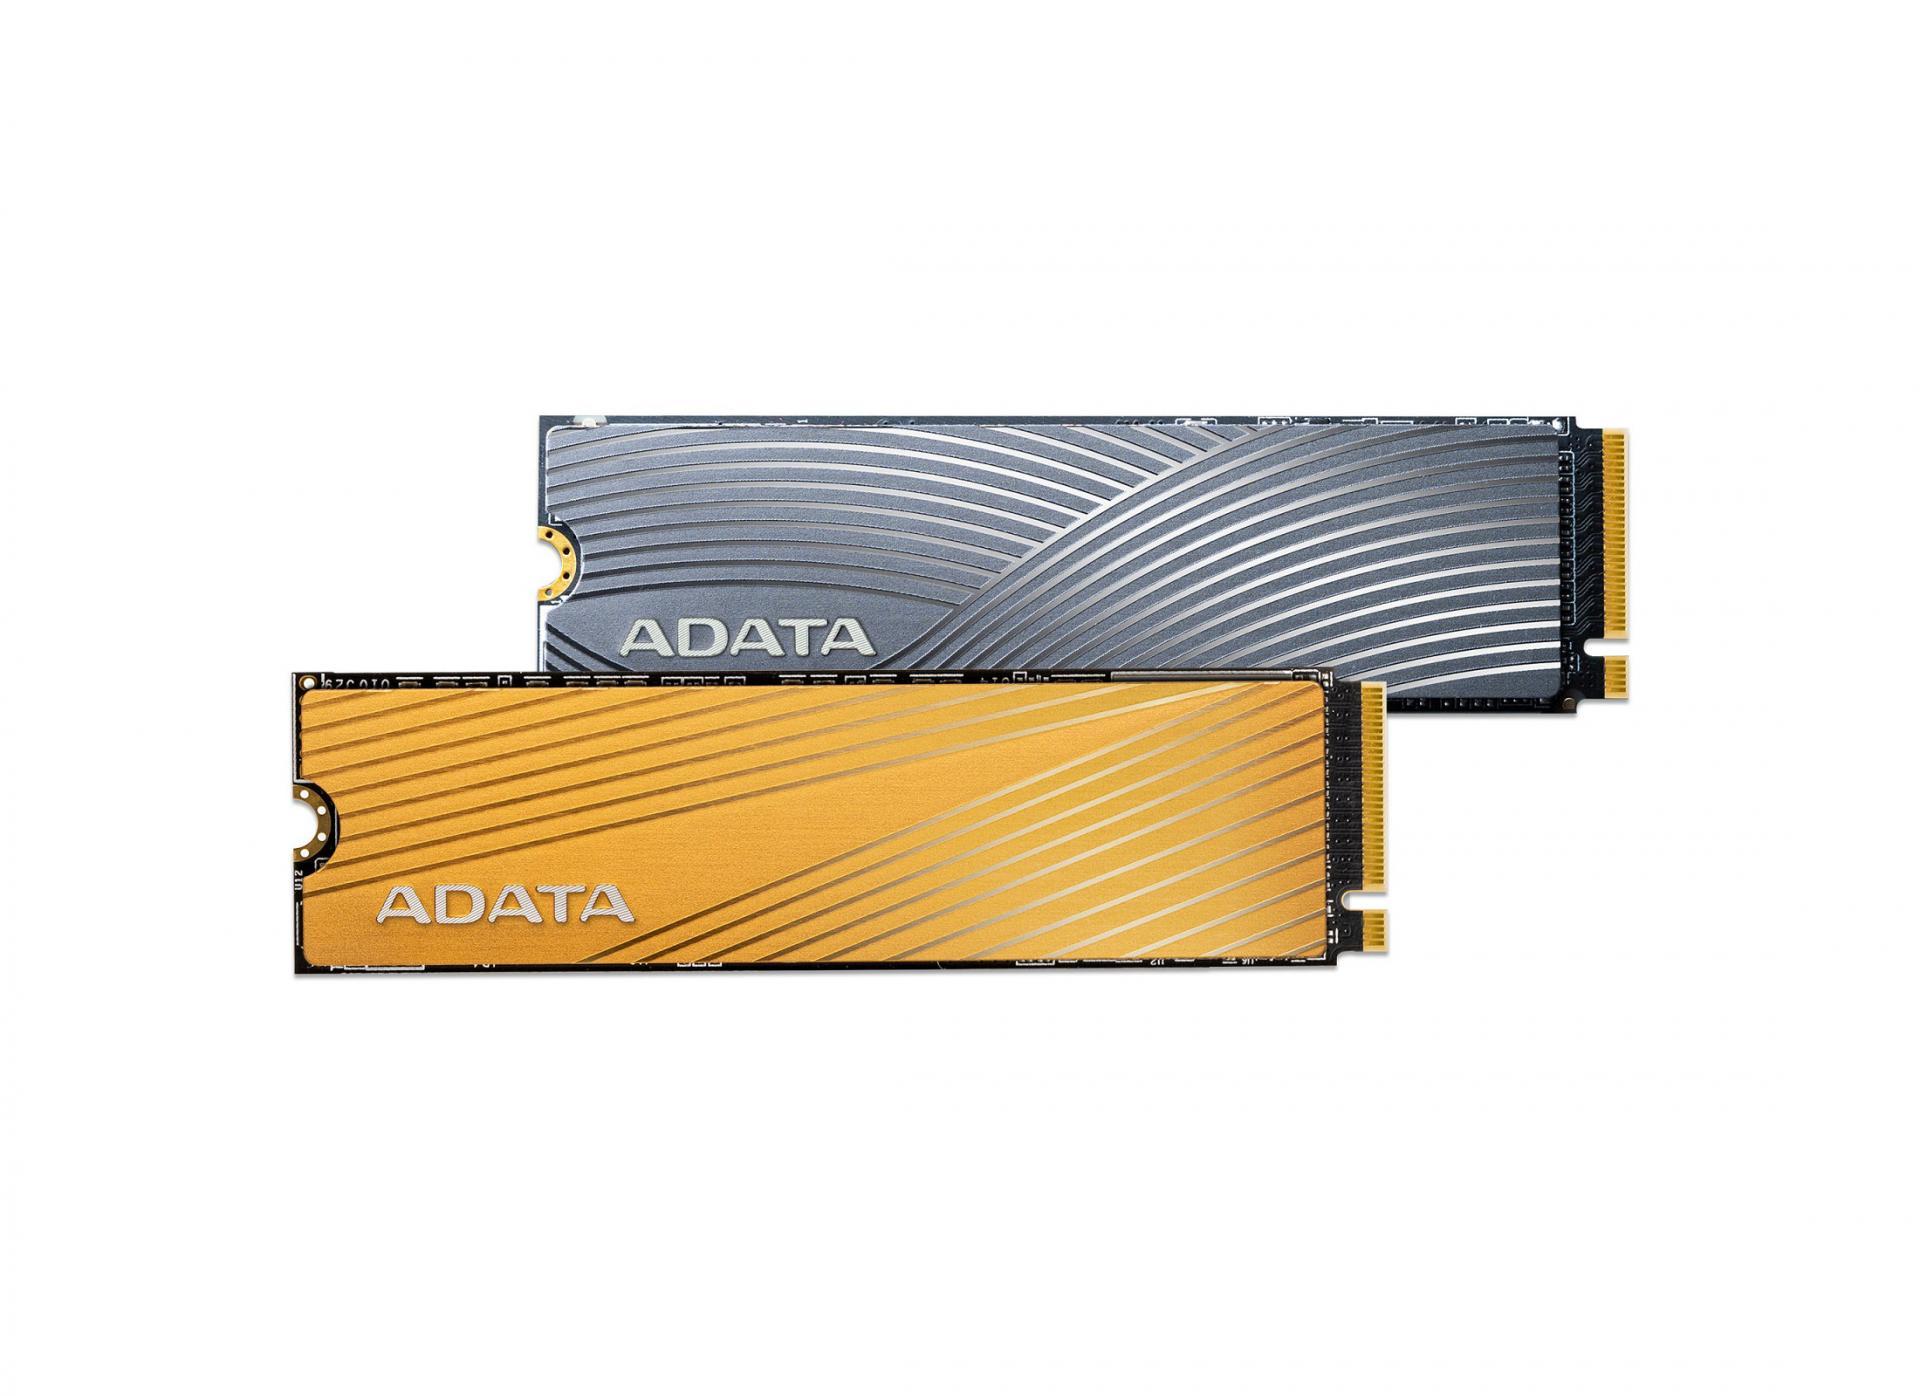 SSD Falcon и Swordfish от ADATA. Оба PCIe Gen3×4 M.2 2280